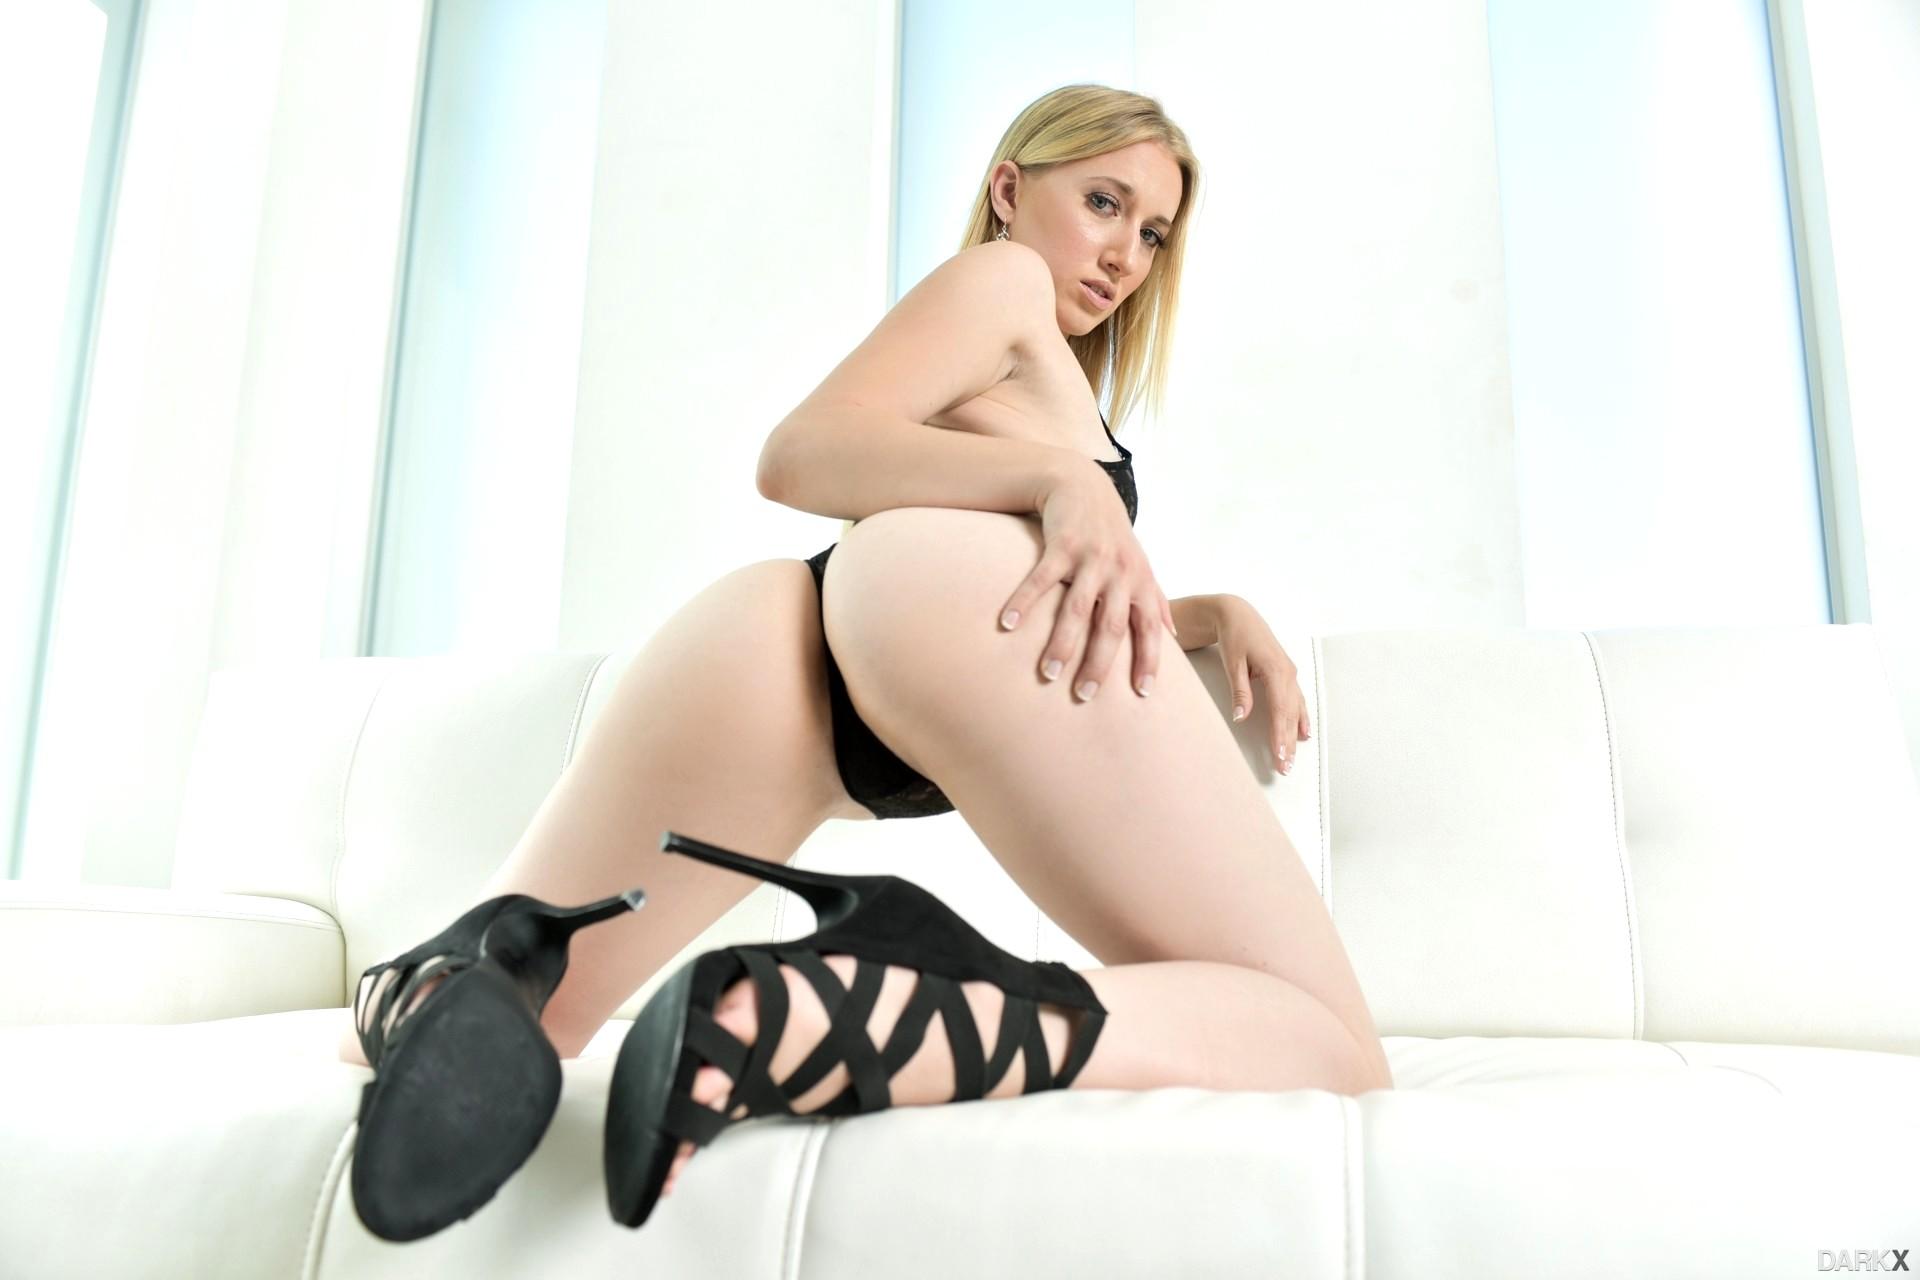 Hot blonde riley reyes goes wild on busty brunette darcie dolce 4